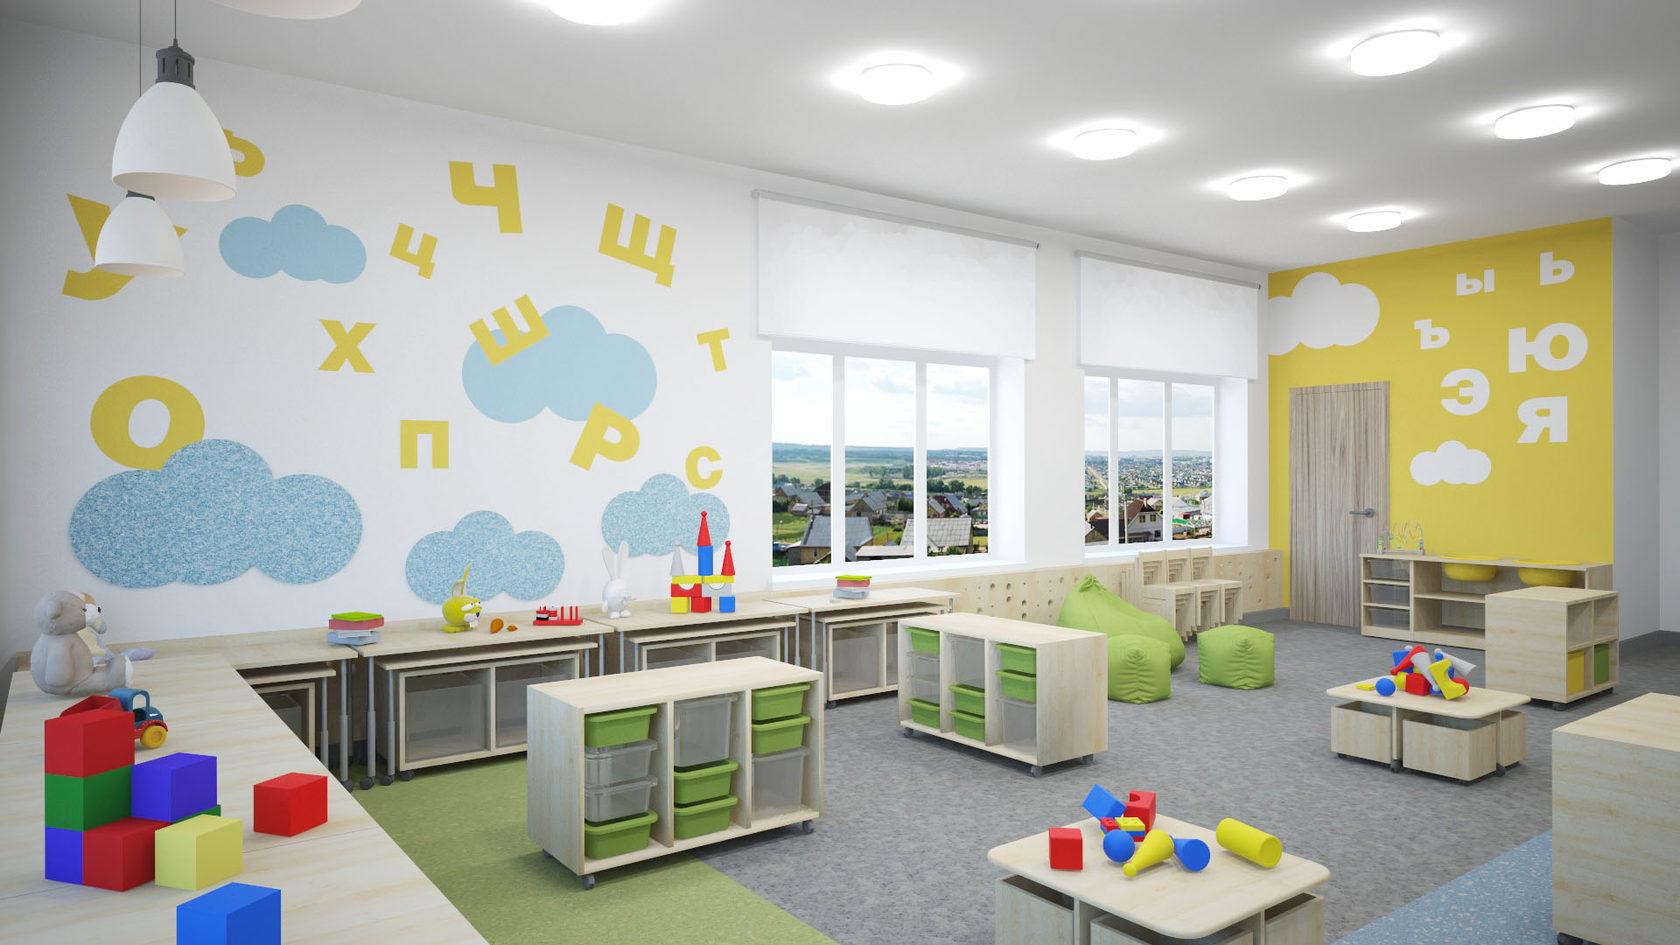 Картинки интерьера групп детского сада